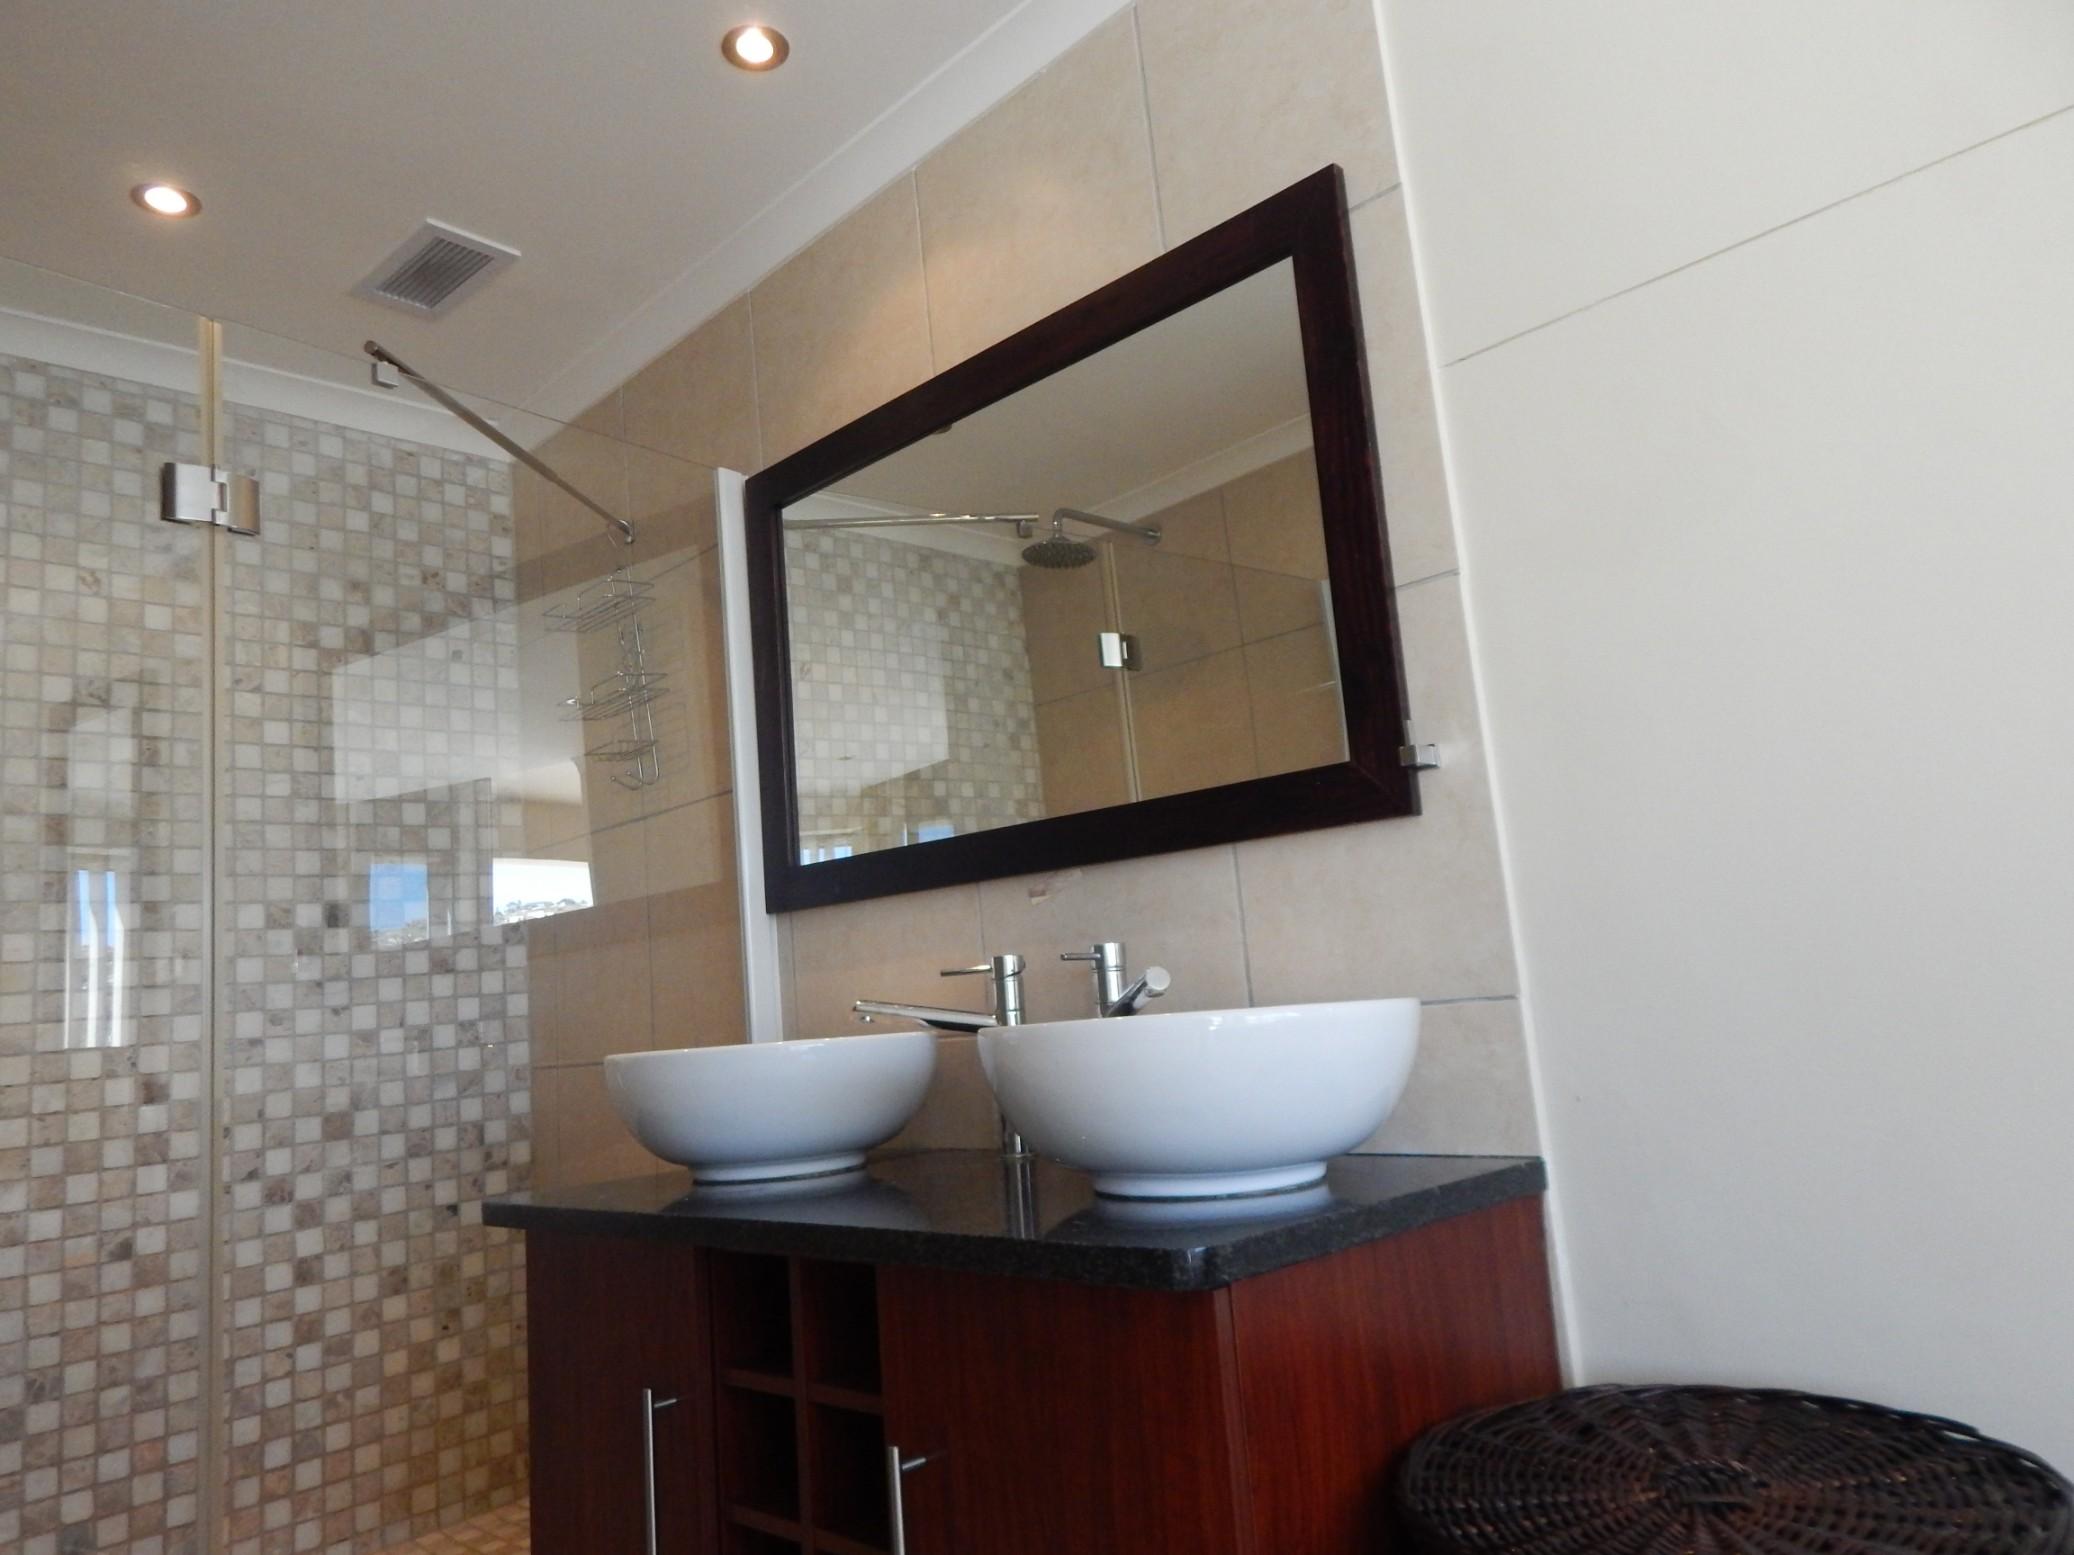 2 Bedroom Apartment for sale in De Bakke ENT0067862 : photo#8